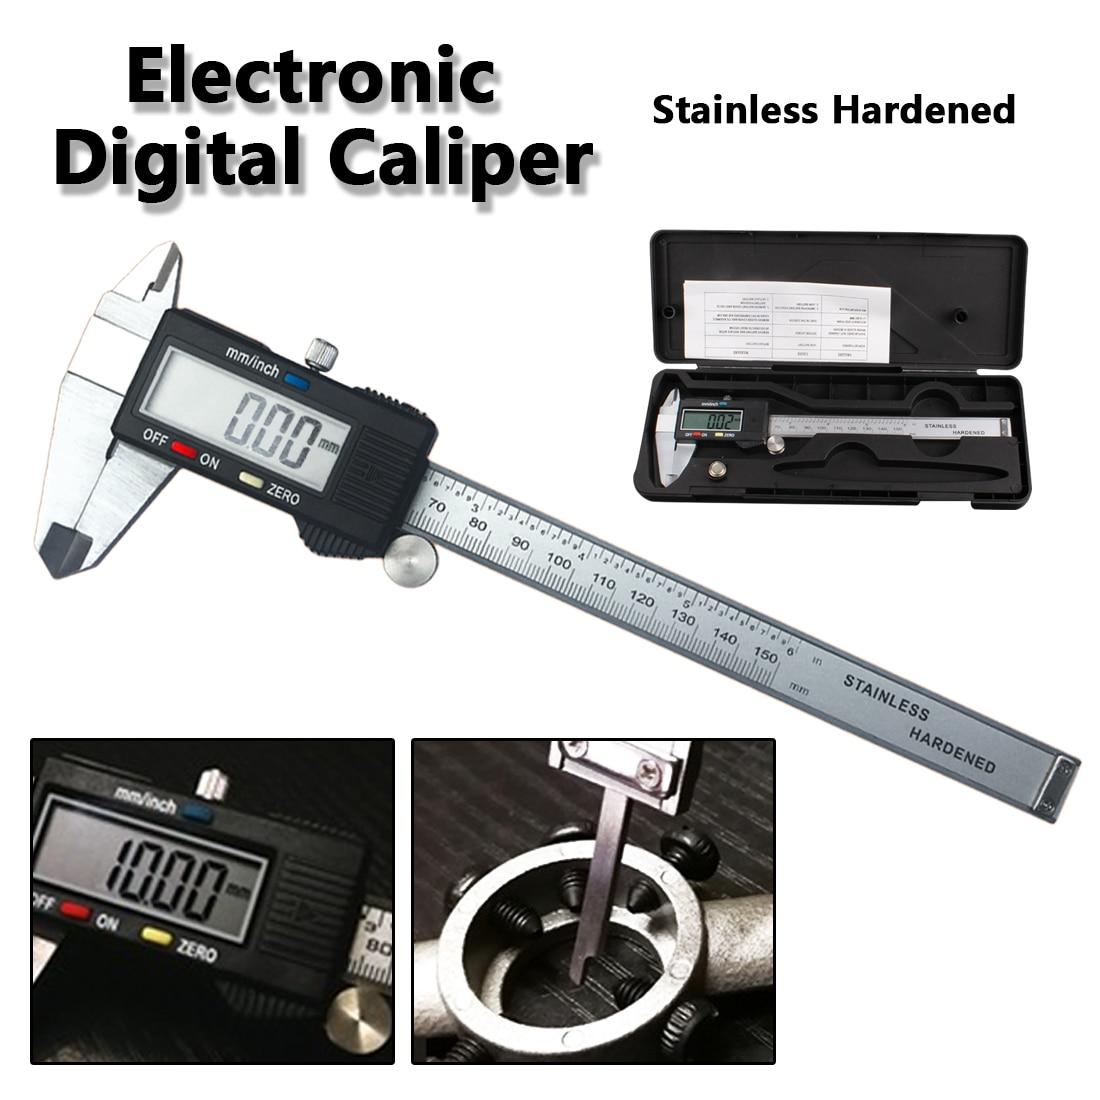 Measuring Instruments Tool 6 inch /150mm Vernier Metric Digital Caliper with LCD Display Stainless Steel Electronic Depth Gauge